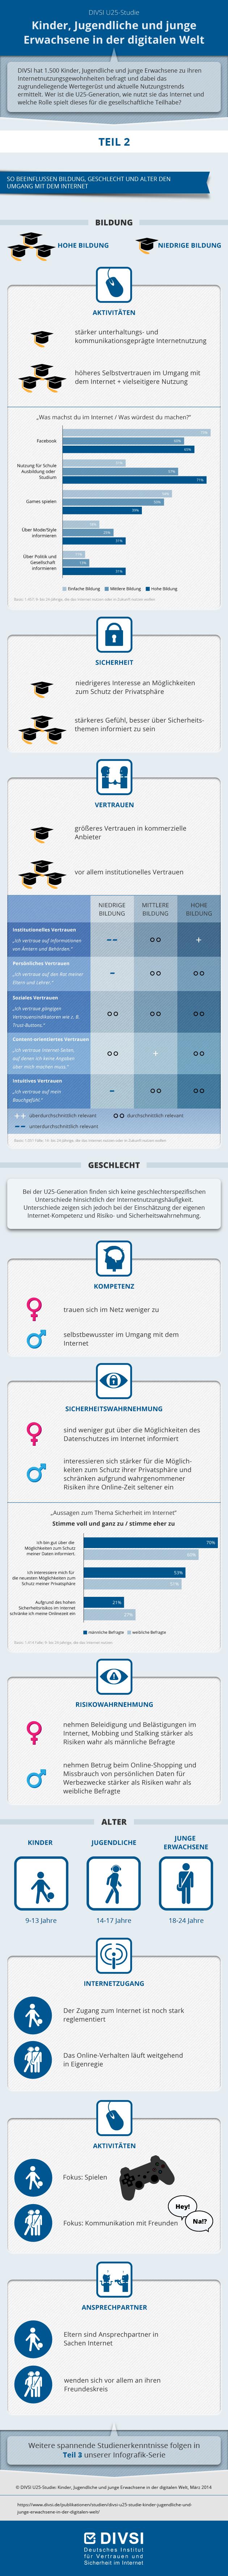 DIVSI Infografik U25-Generation in der digitalen Welt - Einflussfaktoren Bildung, Alter, Geschlecht